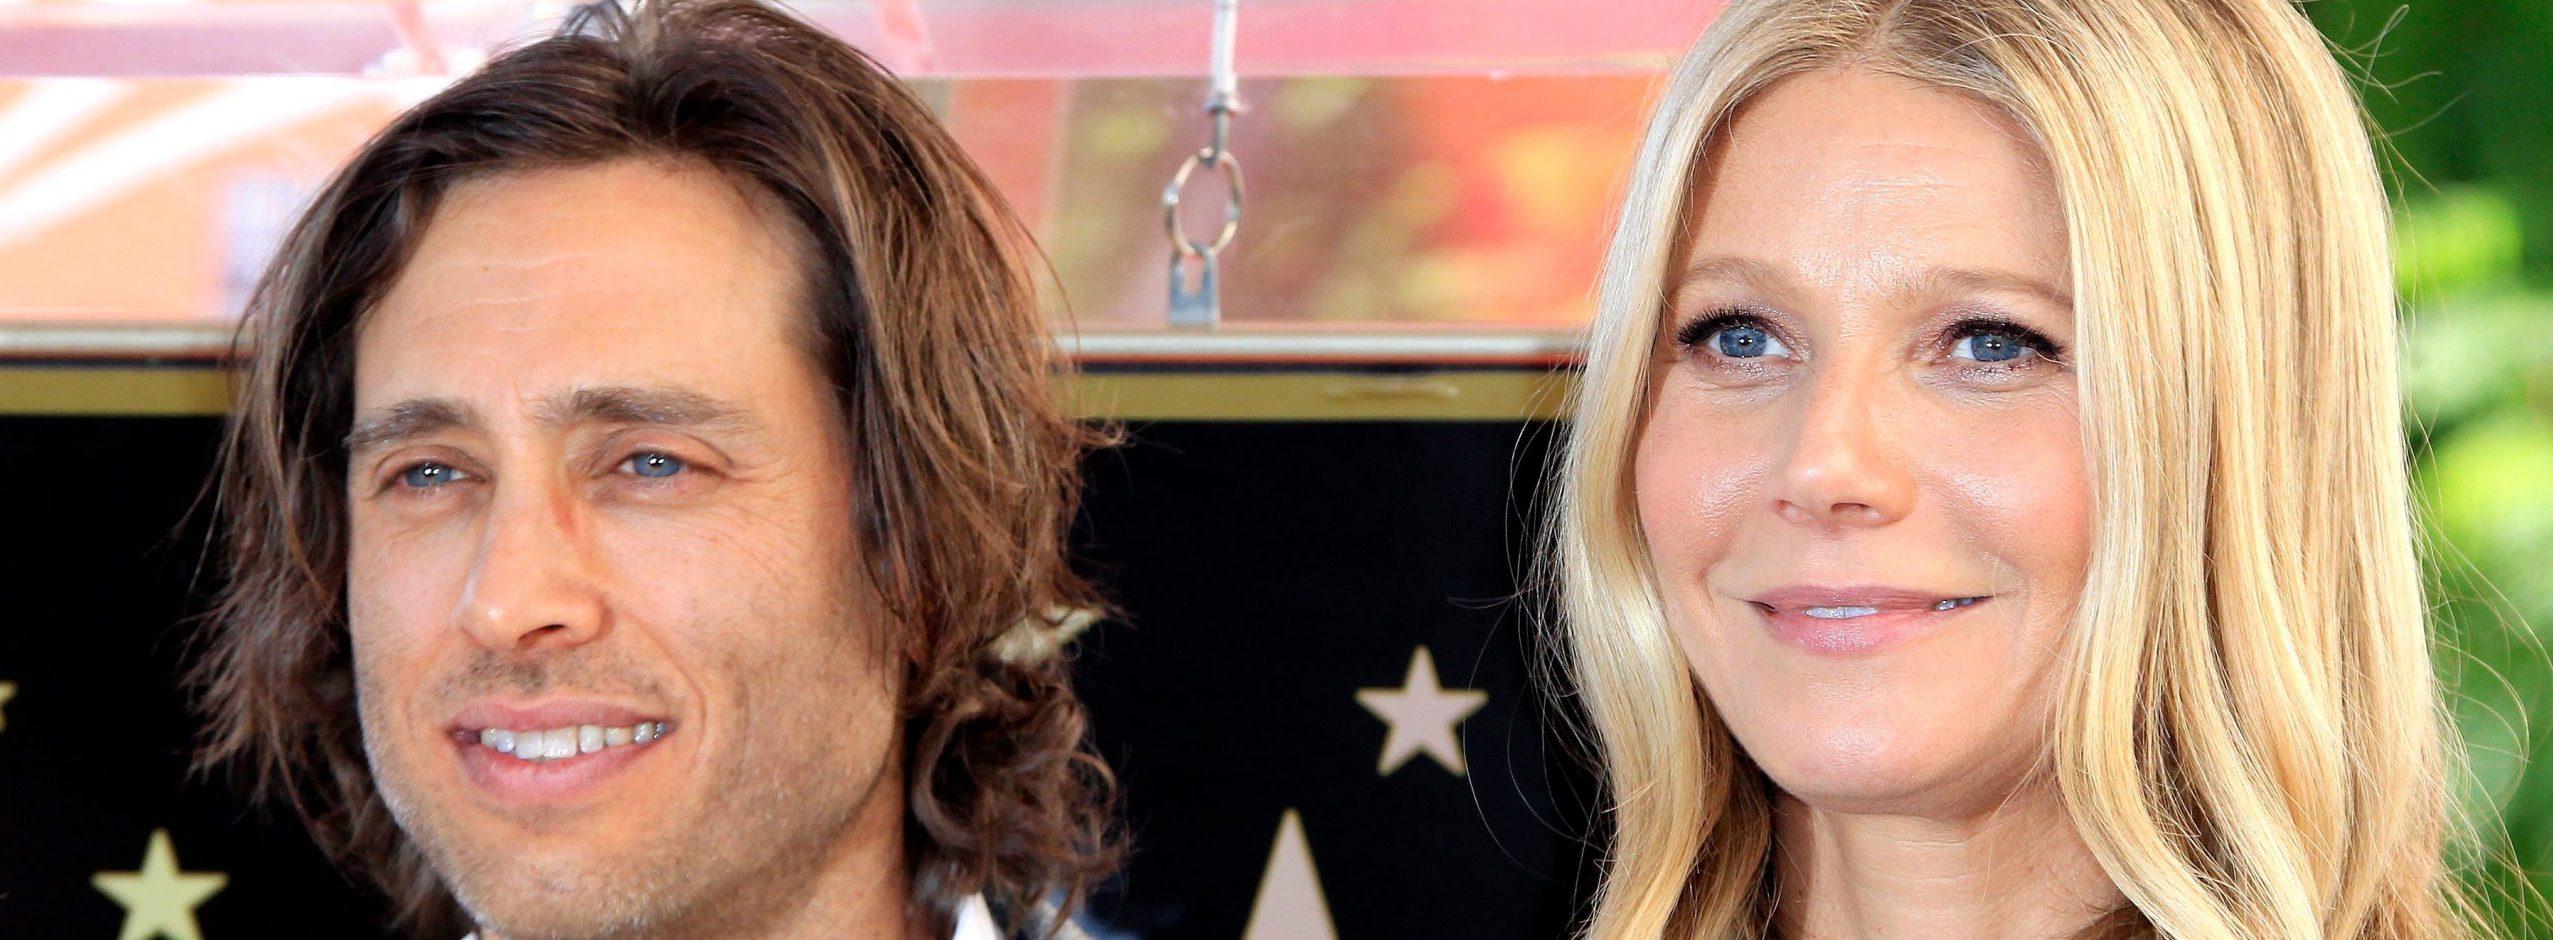 Gwyneth Paltrow Says She Is Still In Honeymoon Phase With Husband Brad Falchuk